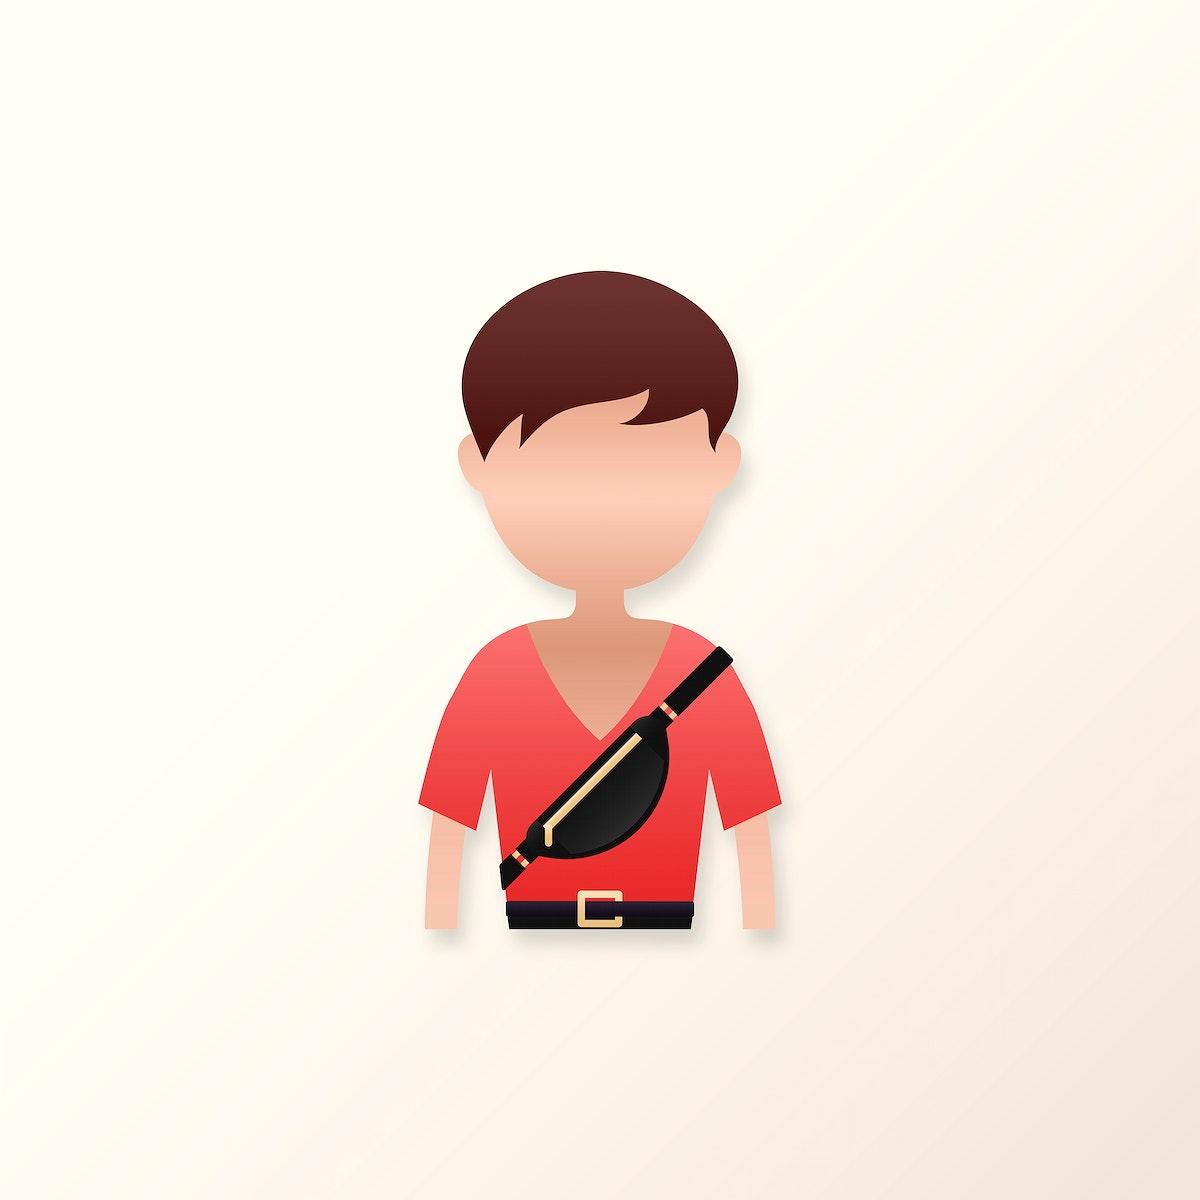 Man with chest bag avatar illustration